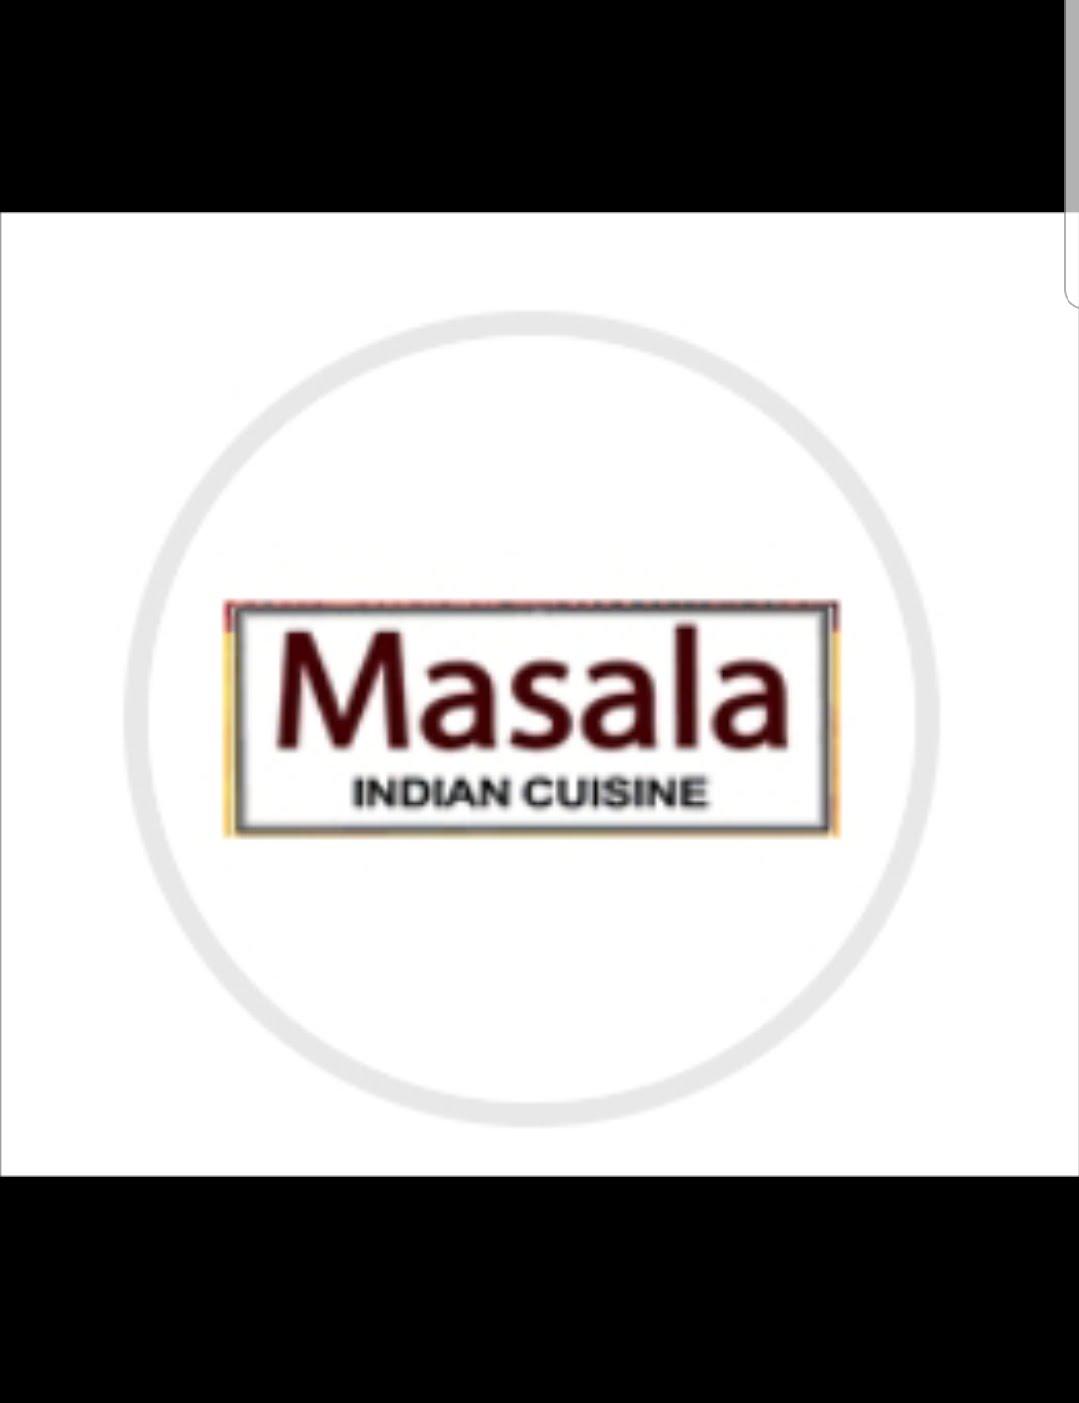 https://eatstreet.com/iowacity-ia/restaurants/masala-iowa-city